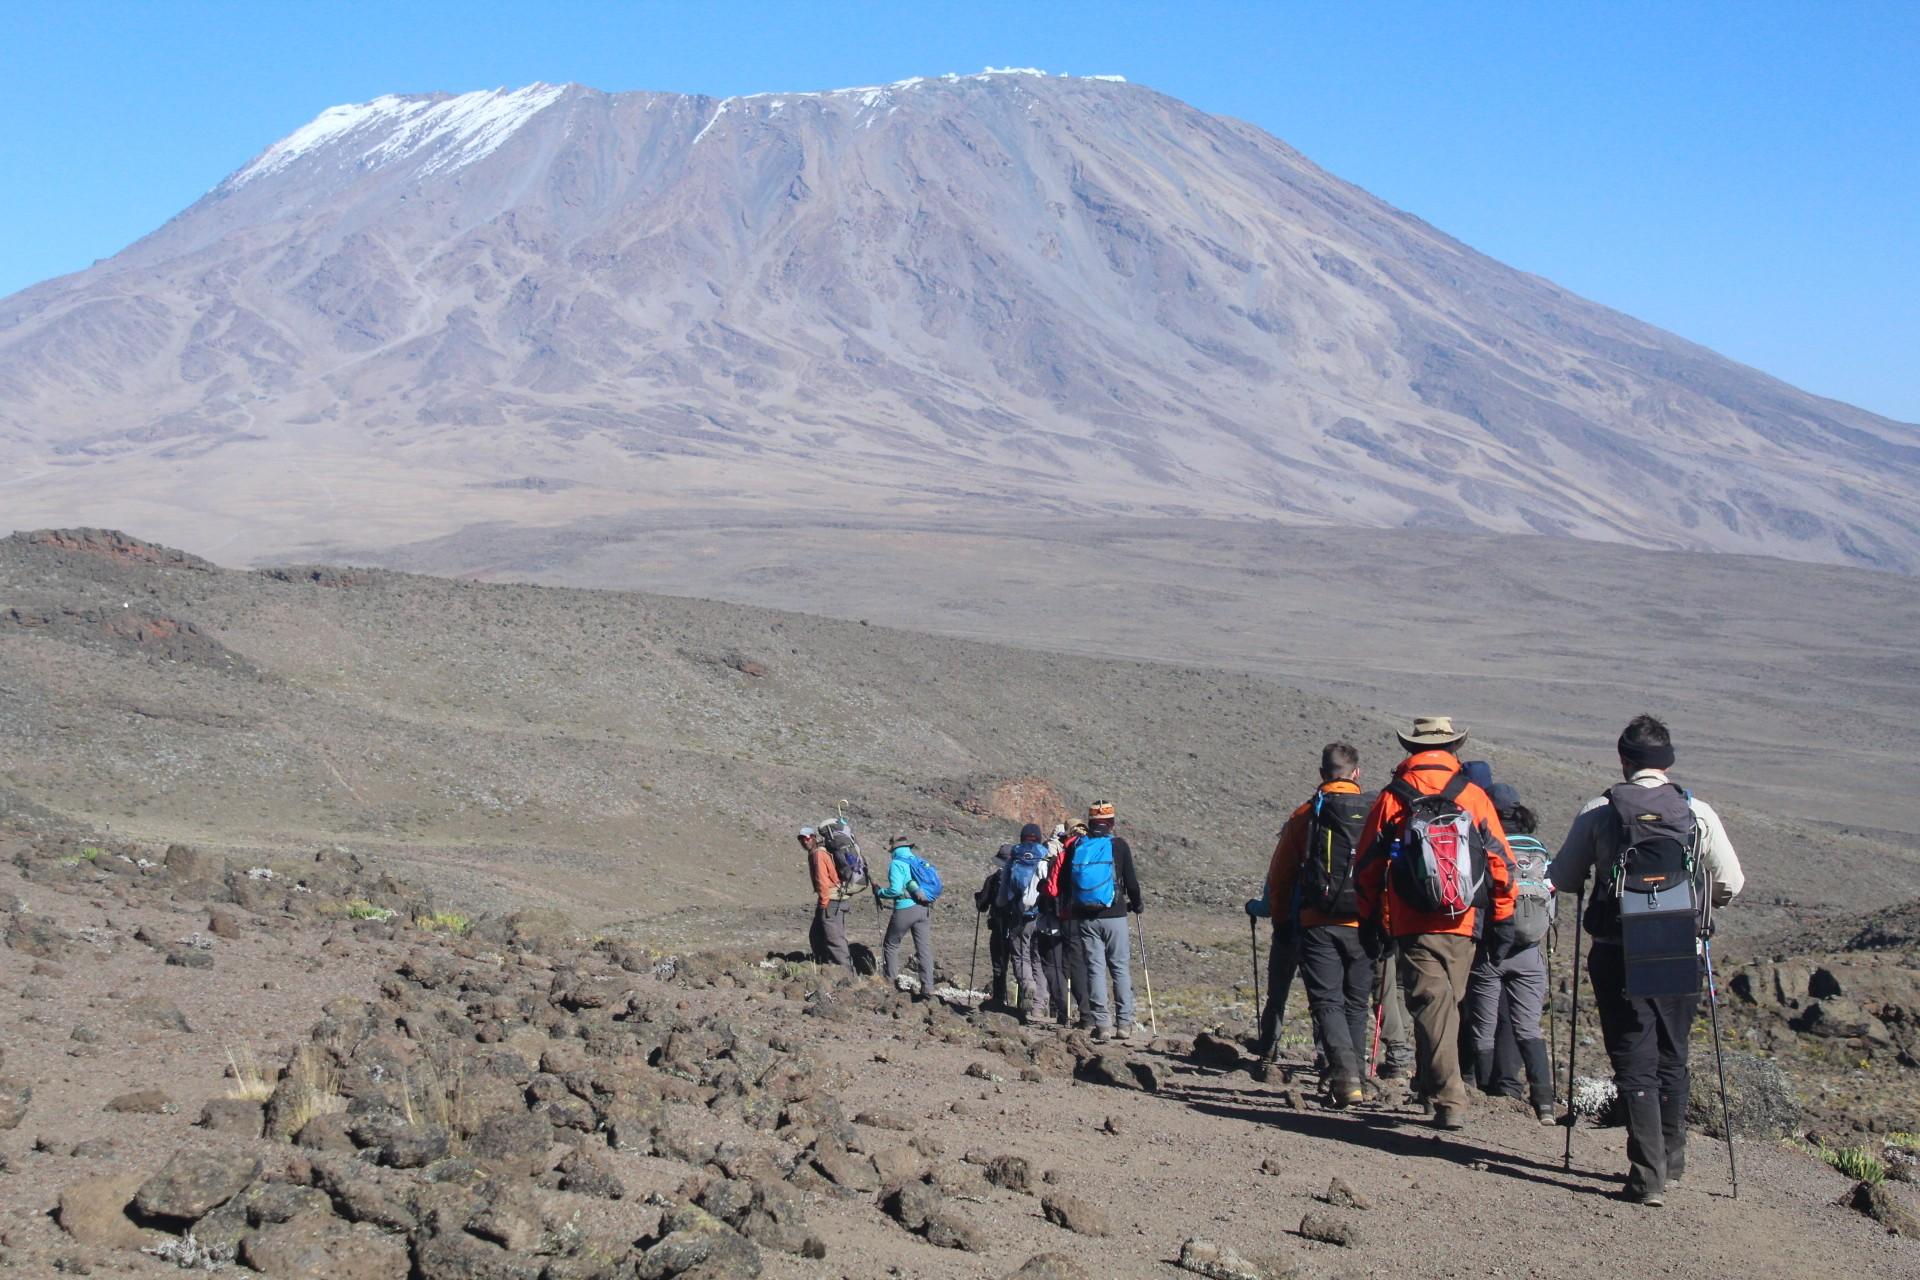 A trekking group on their way up Mount Kilimanjaro